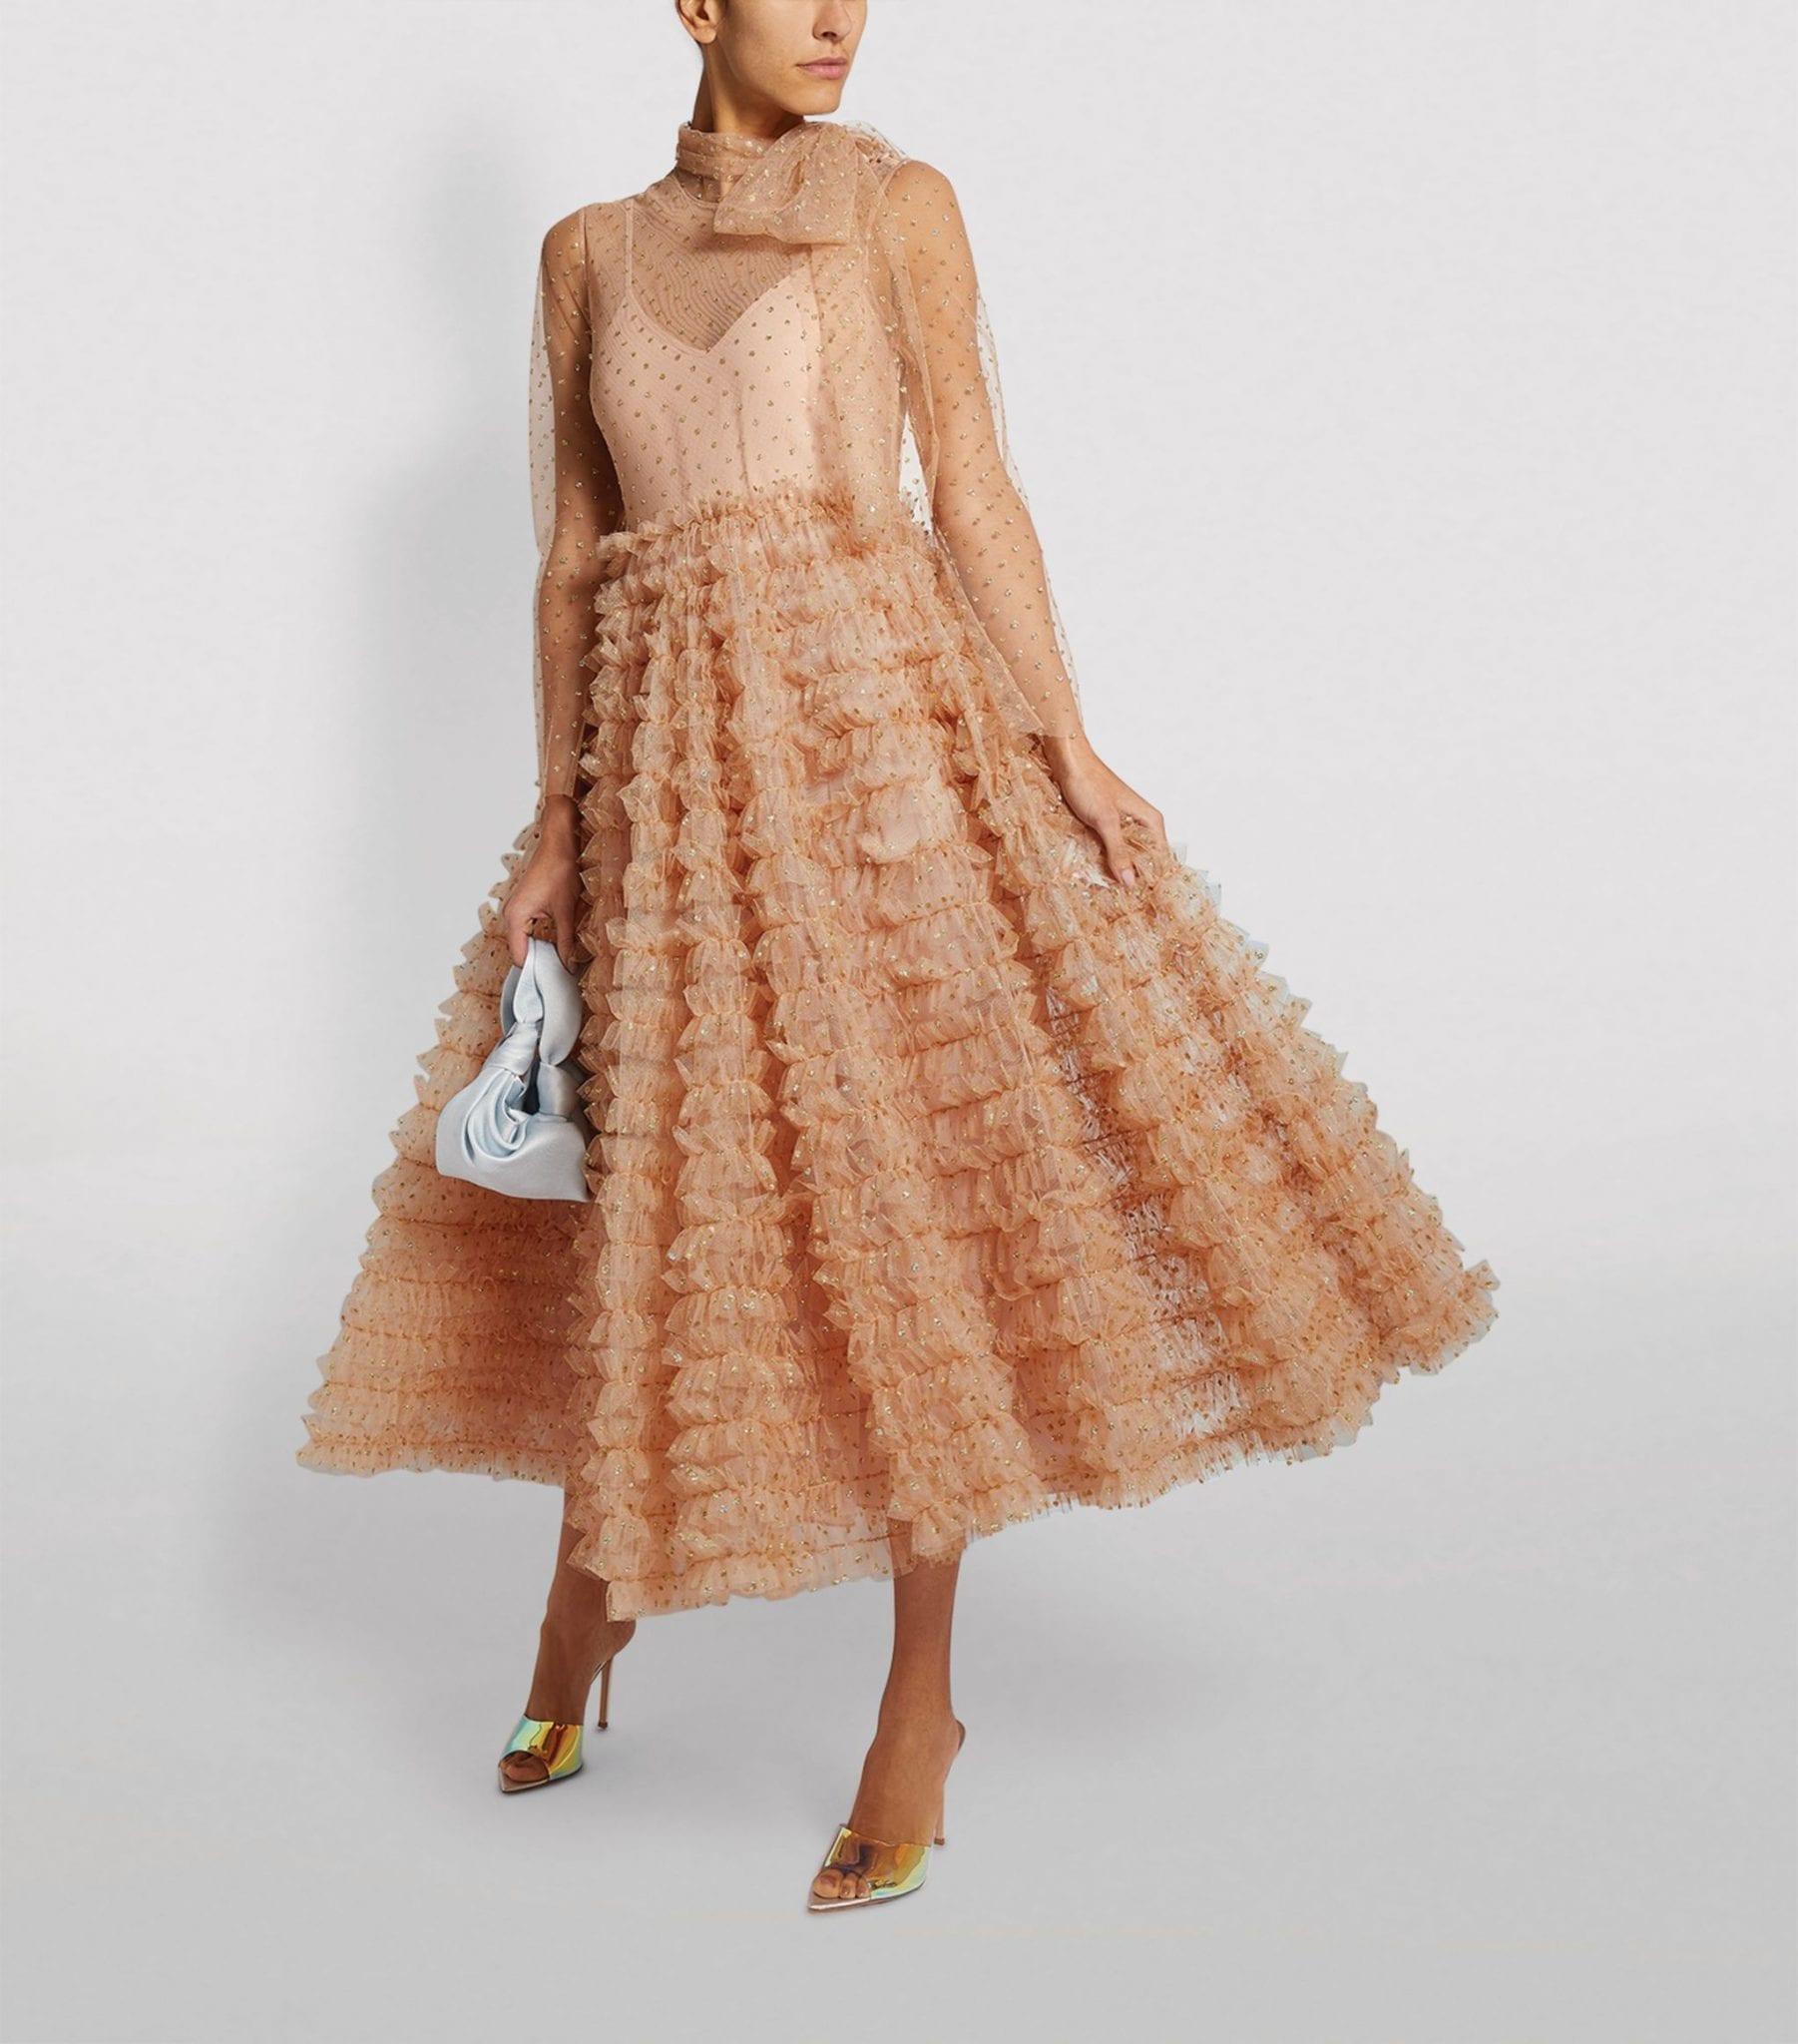 REDVALENTINO Glitter-Embellished Polka-Dot Dress